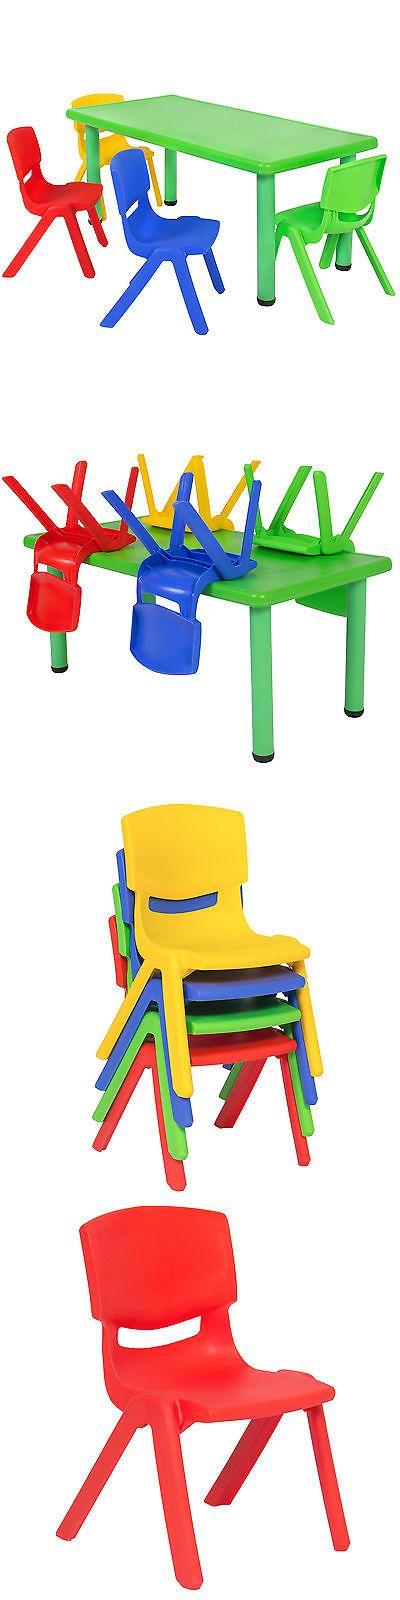 Best 25 Kids plastic chairs ideas on Pinterest Plastic outdoor